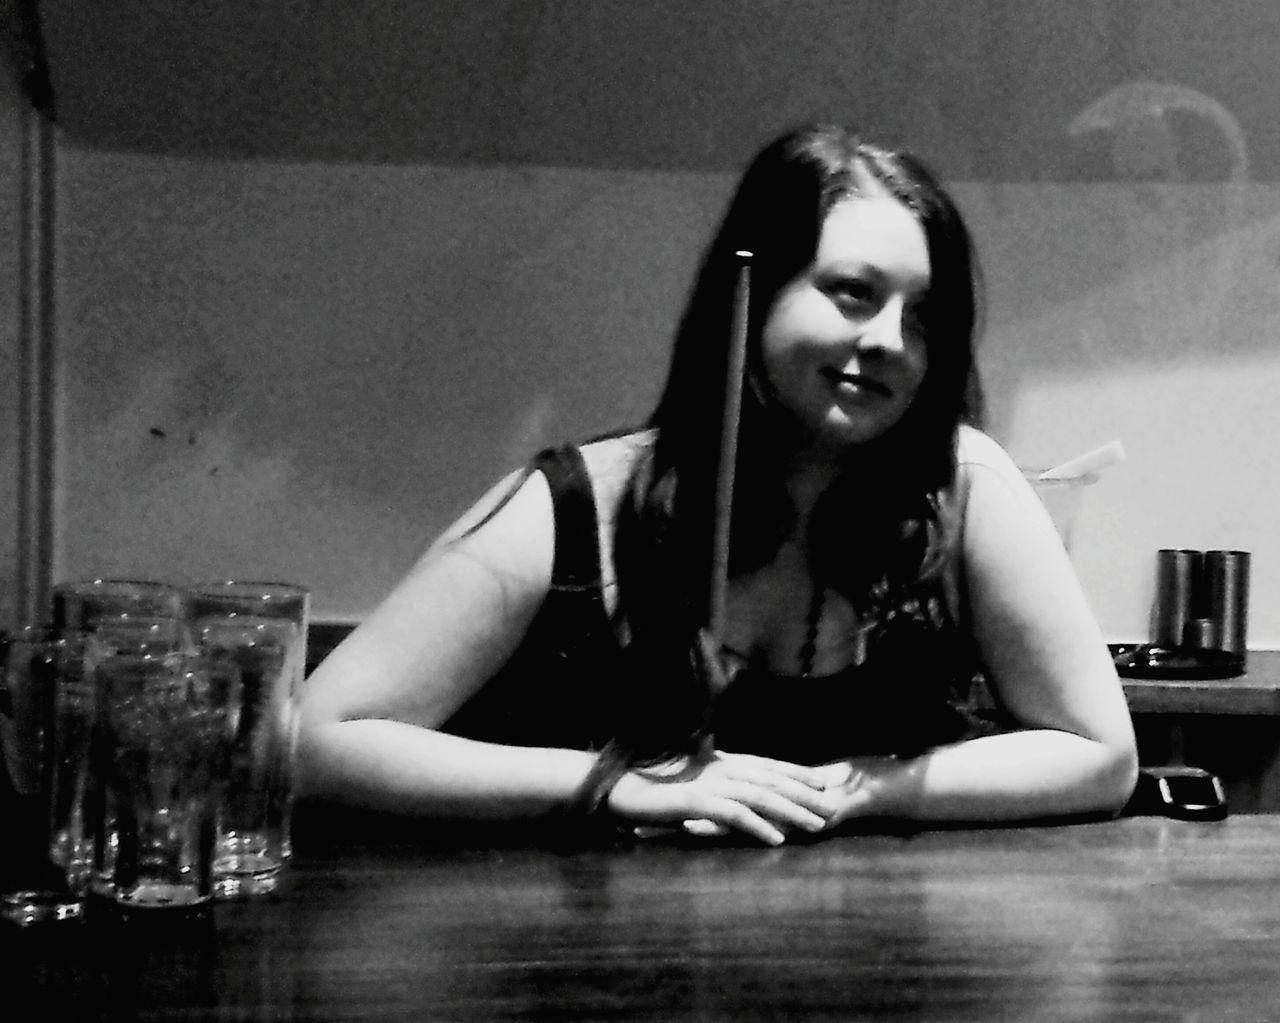 Bar keep xxxxxxx Nefilian Xxxxxxx Barmaid Pub Pool X